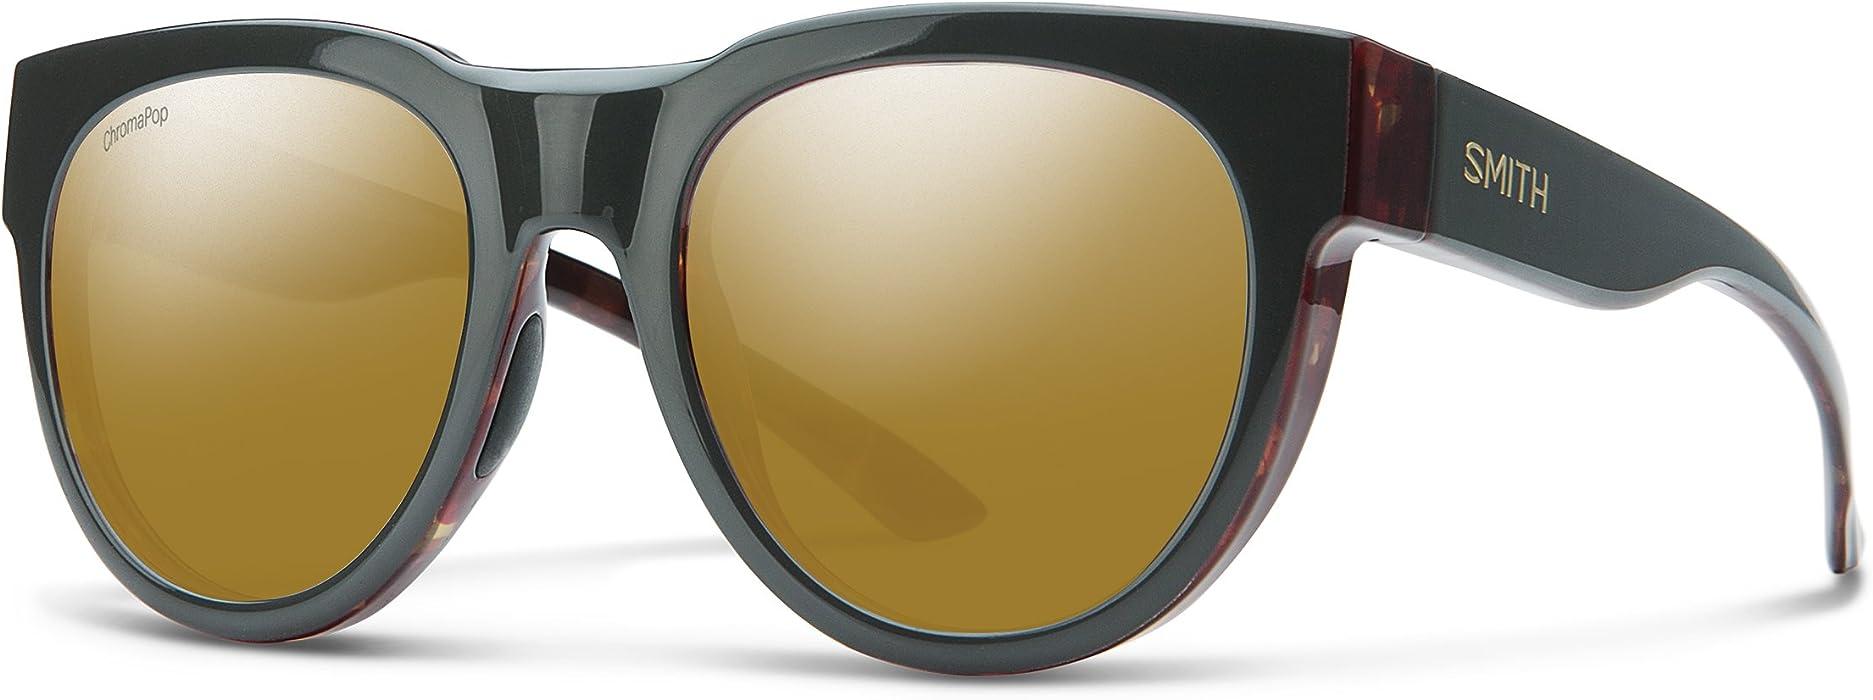 4b6d6a51d13 Amazon.com  Smith Crusader Chromapop Polarized Sunglasses